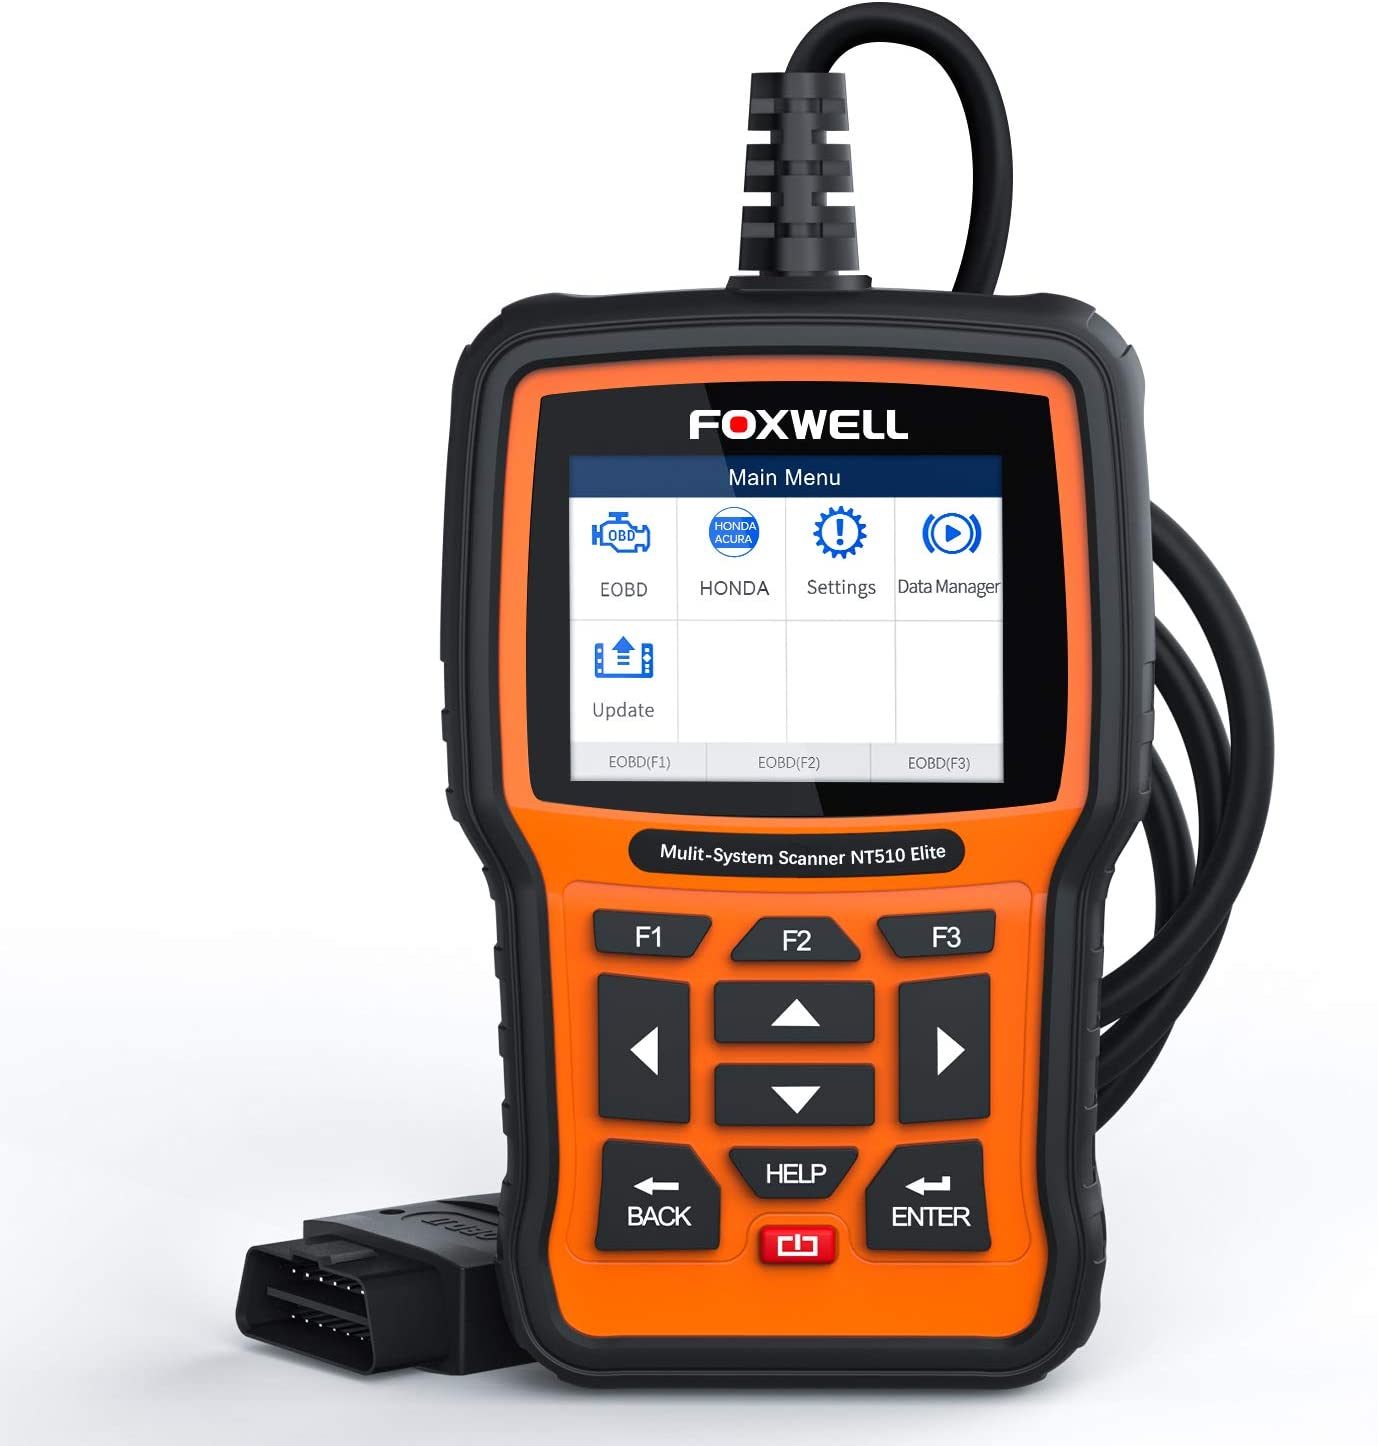 Bi Directional Scan Tool >> Foxwell Nt510 Elite Obd2 Bi Directional Scan Tool For Honda Acura All System Diagnostics Abs Srs Transmission Battery Registeration Auto Bleed Tps Sas